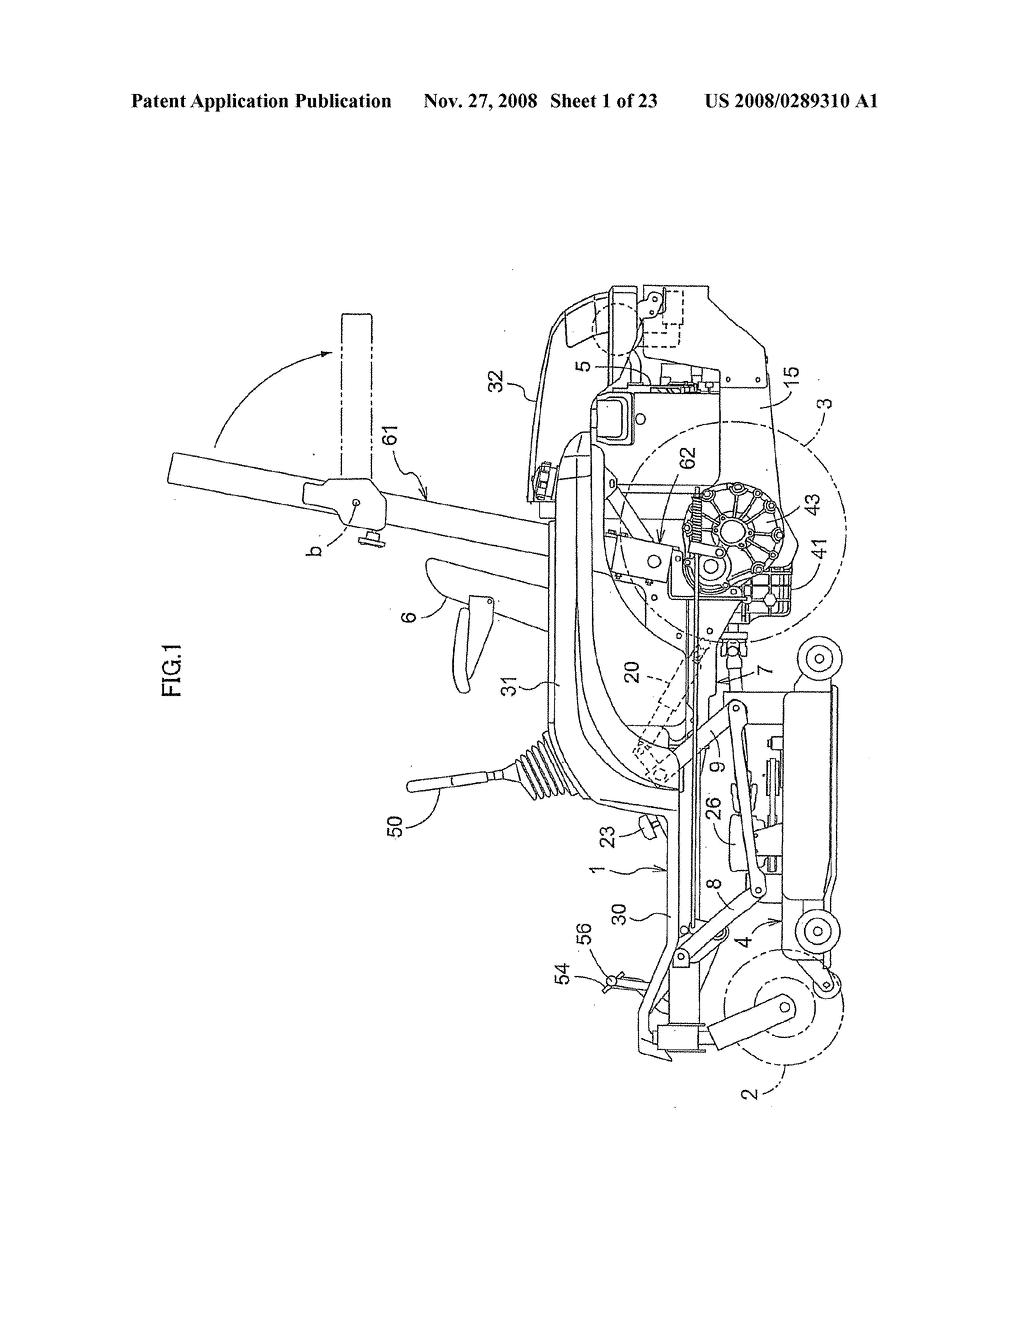 Lawn Mower Schematic Diagram / Toro Lawn Mower Wheel Using